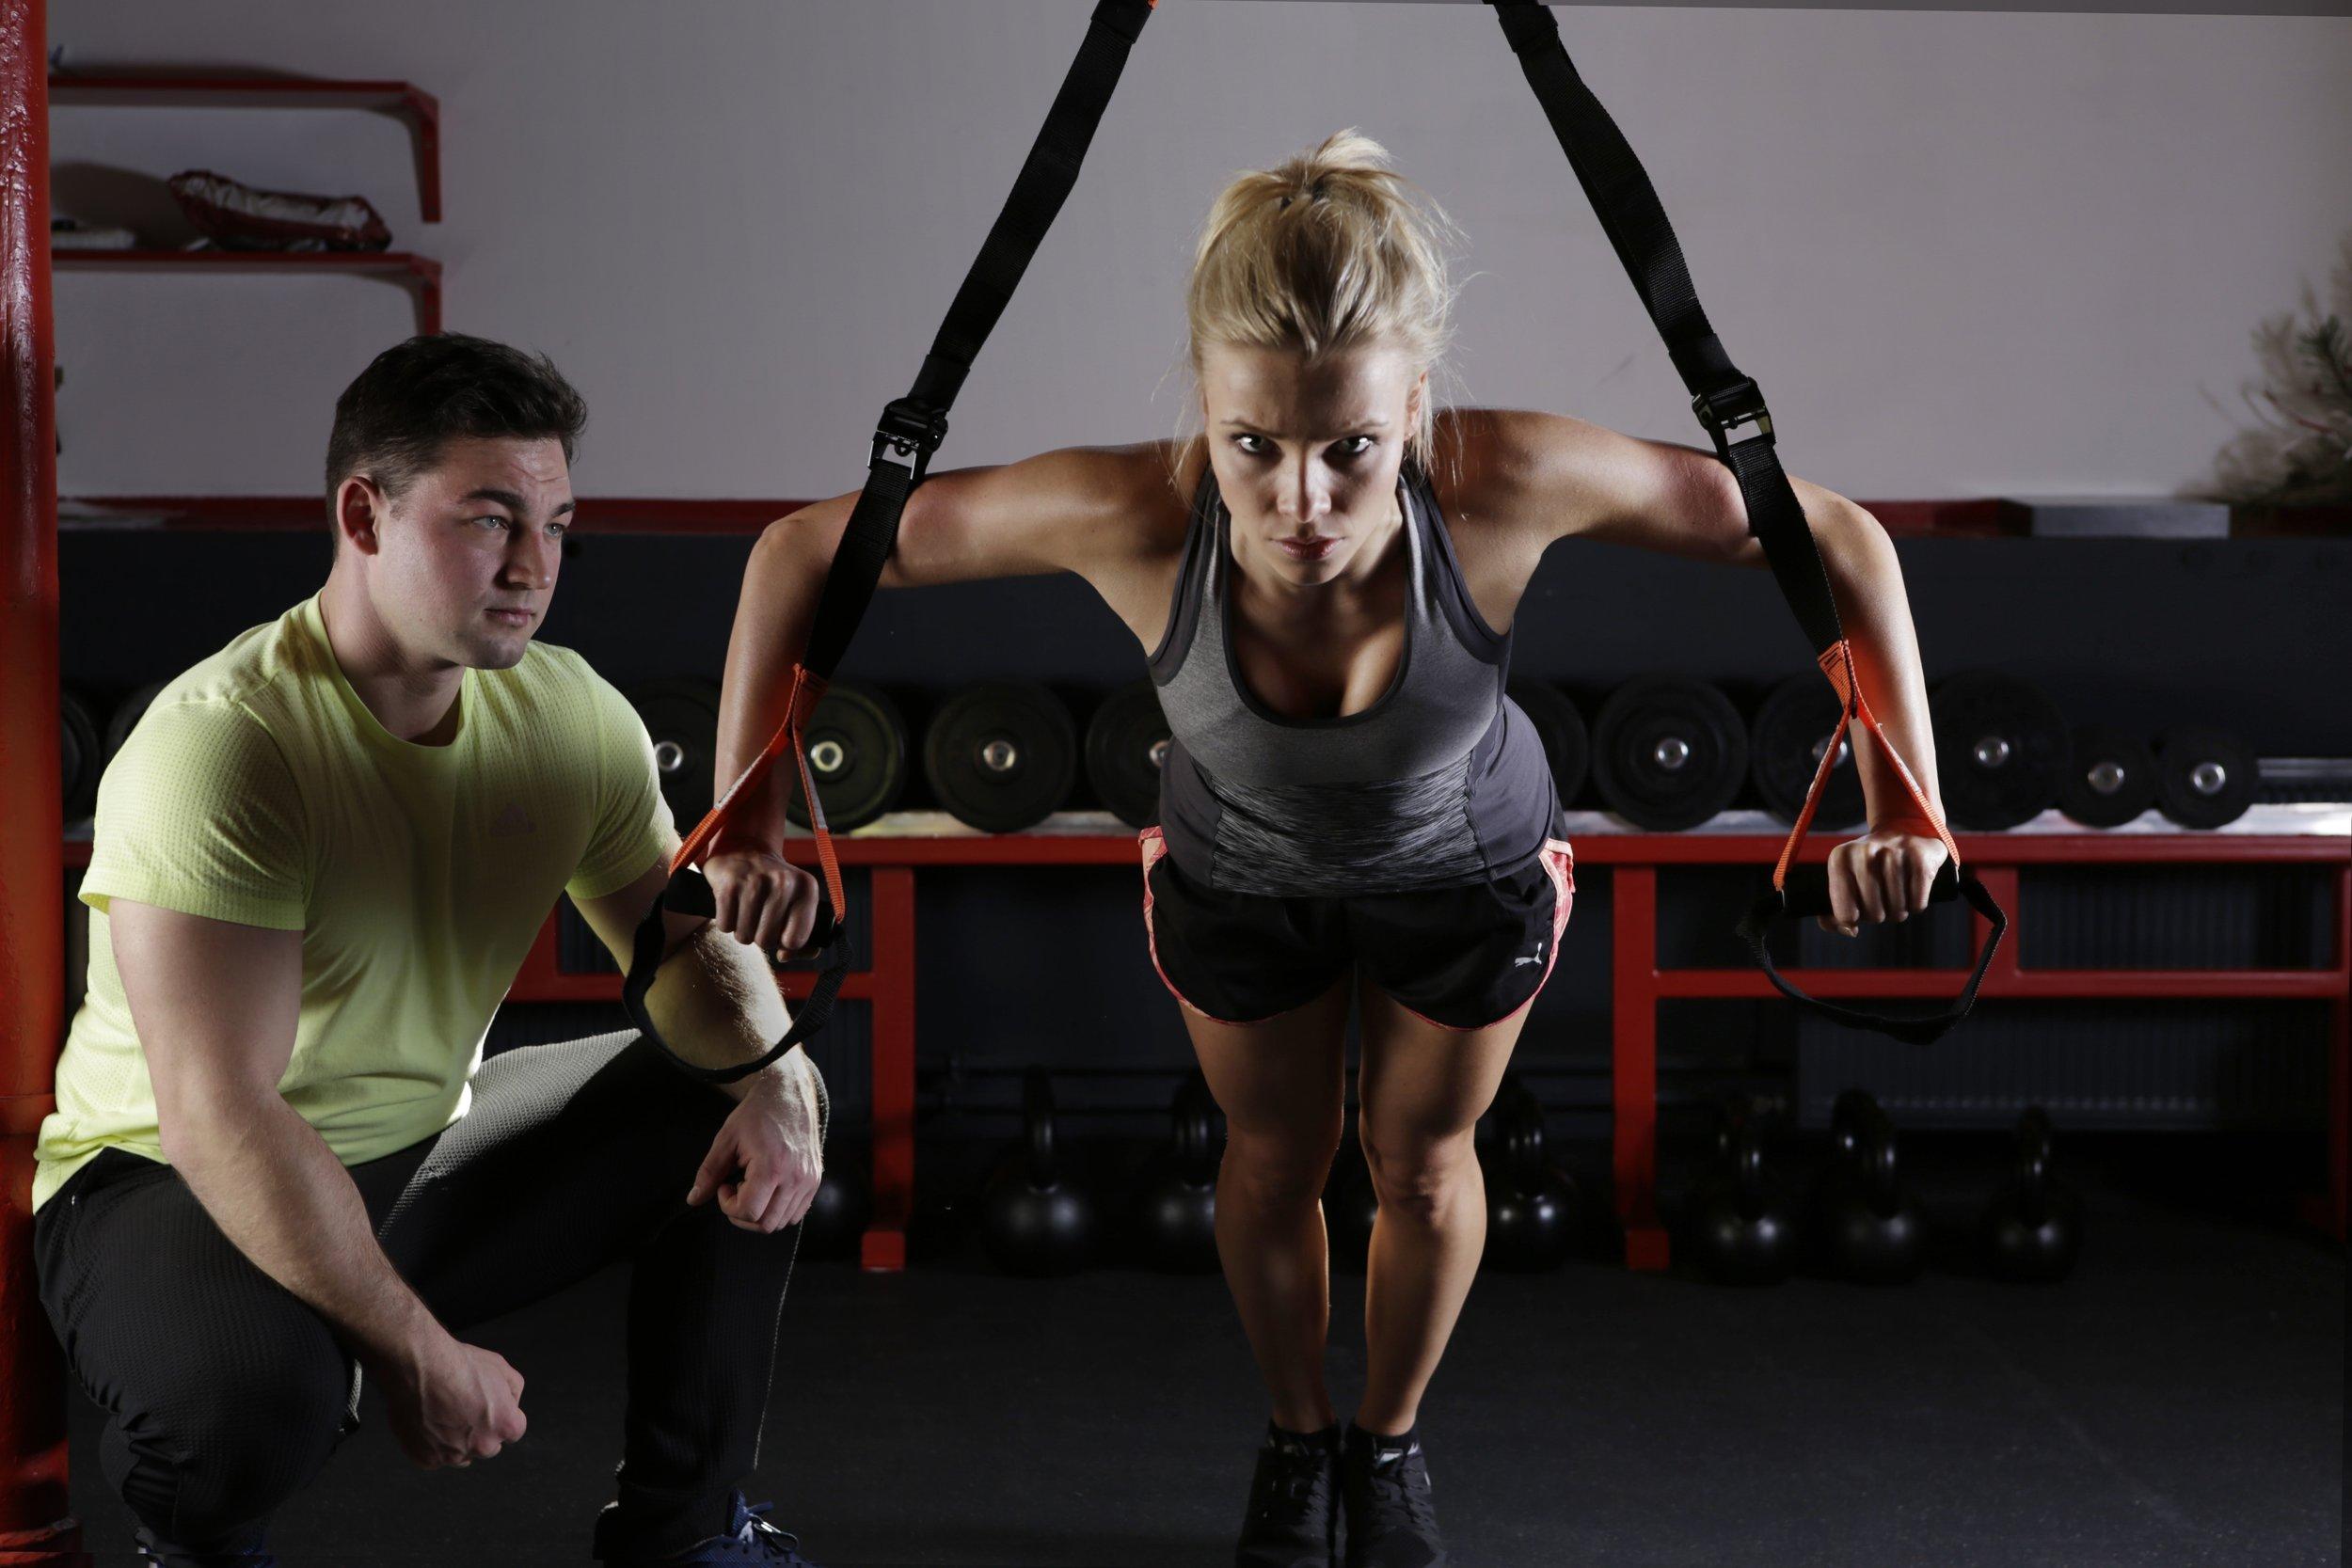 South Austin - Orthopedics & Sports Medicine